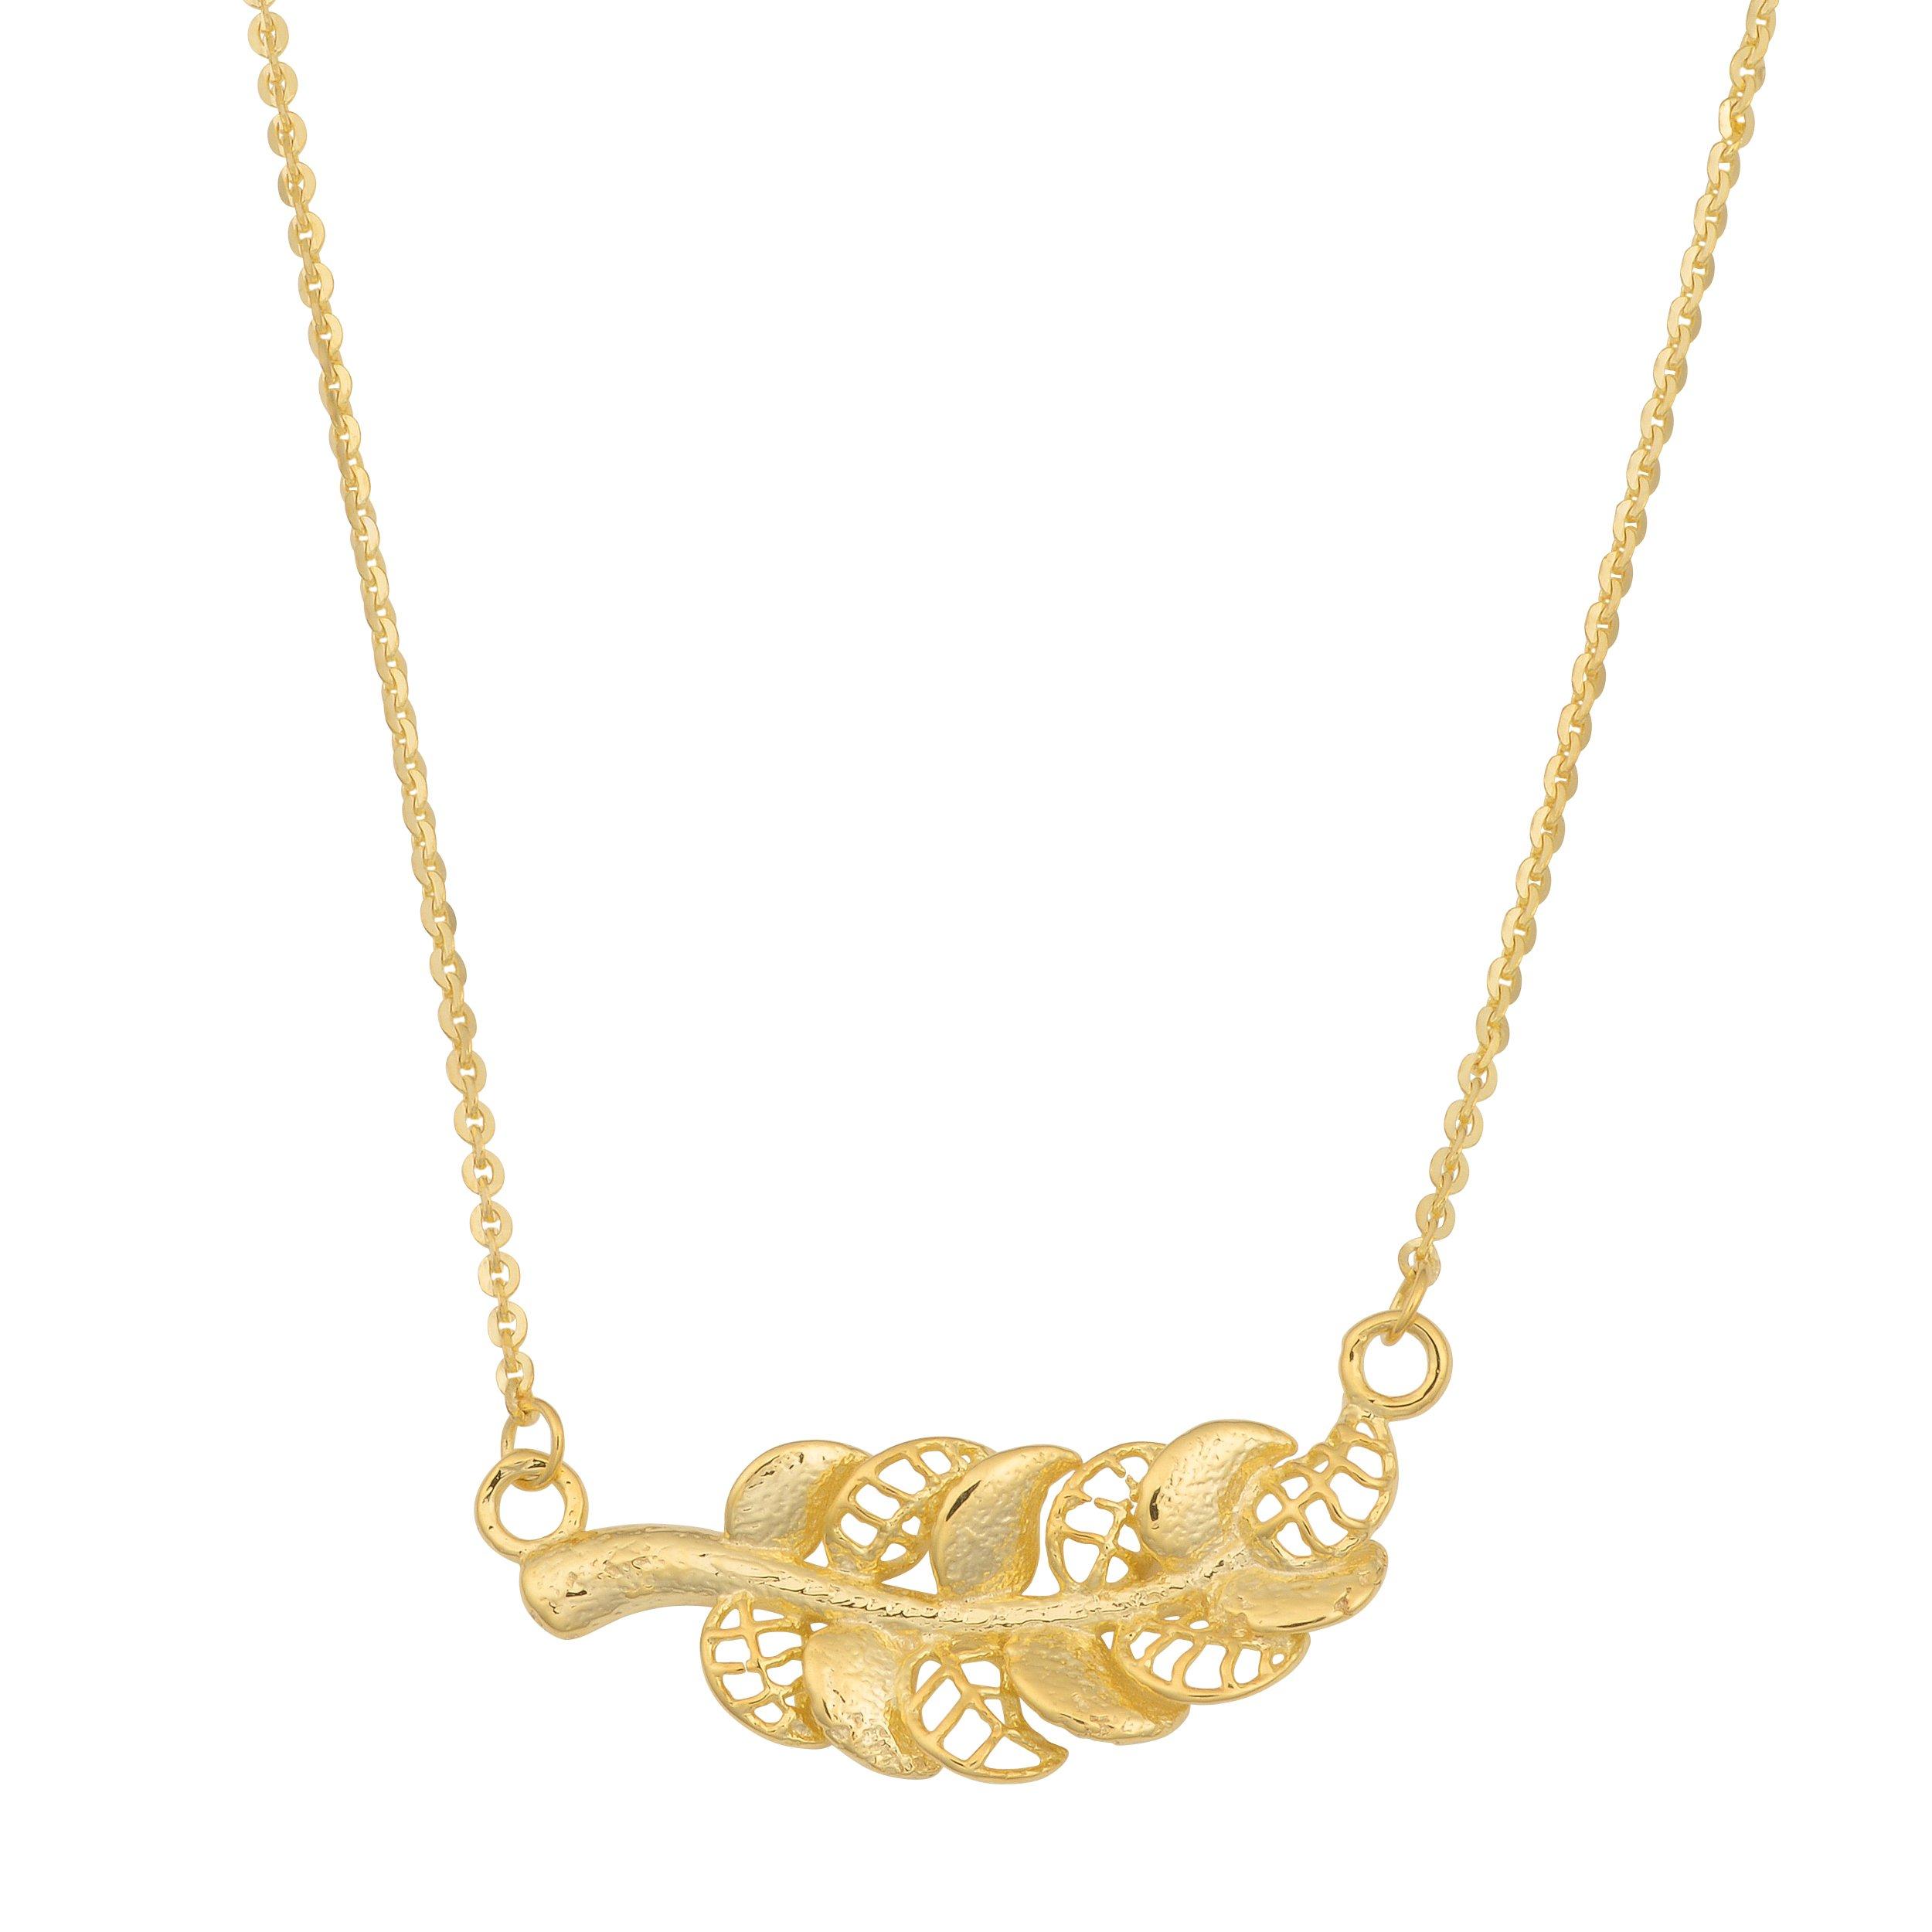 Kooljewelry 14k Yellow Gold Feather Necklace (18 inch)